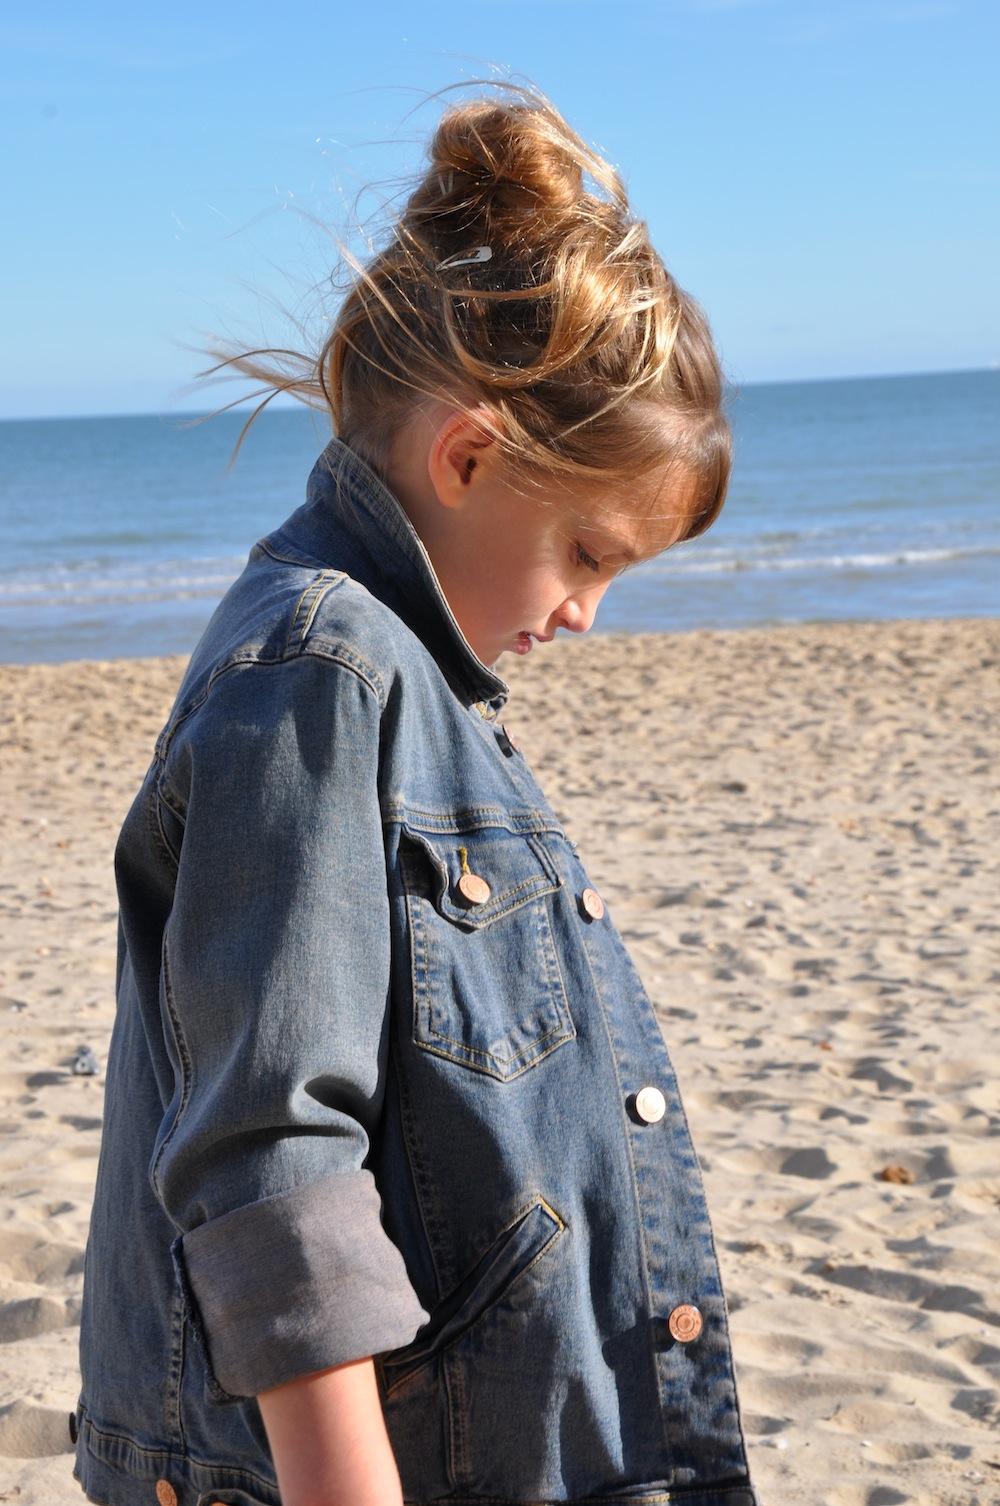 Original_sister_beach